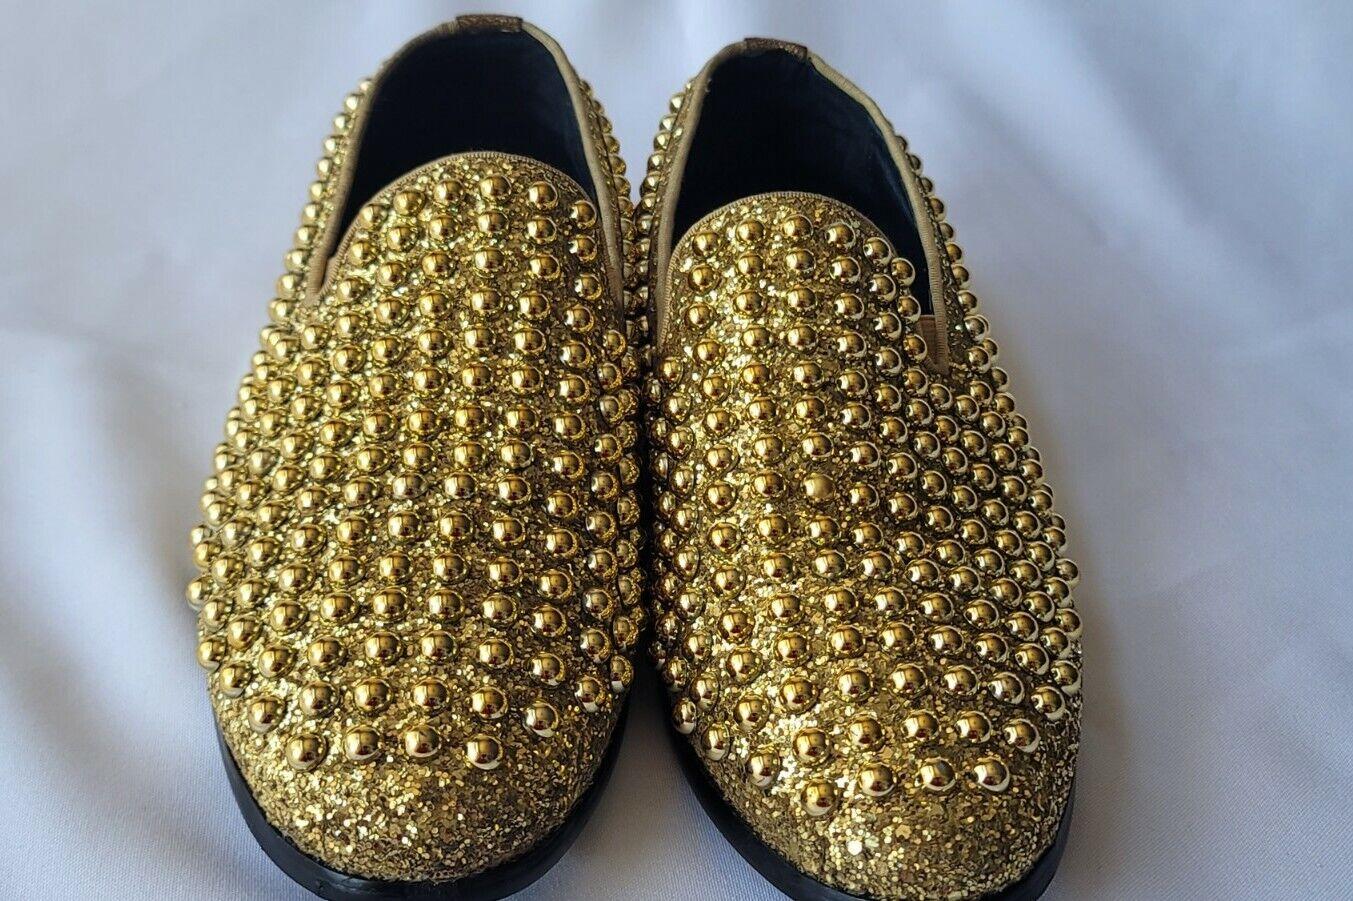 Jump Newyork Luxor-ii Pearl Shaped Ornamented Upper Dress Loafers Sz 9.5 #422.4